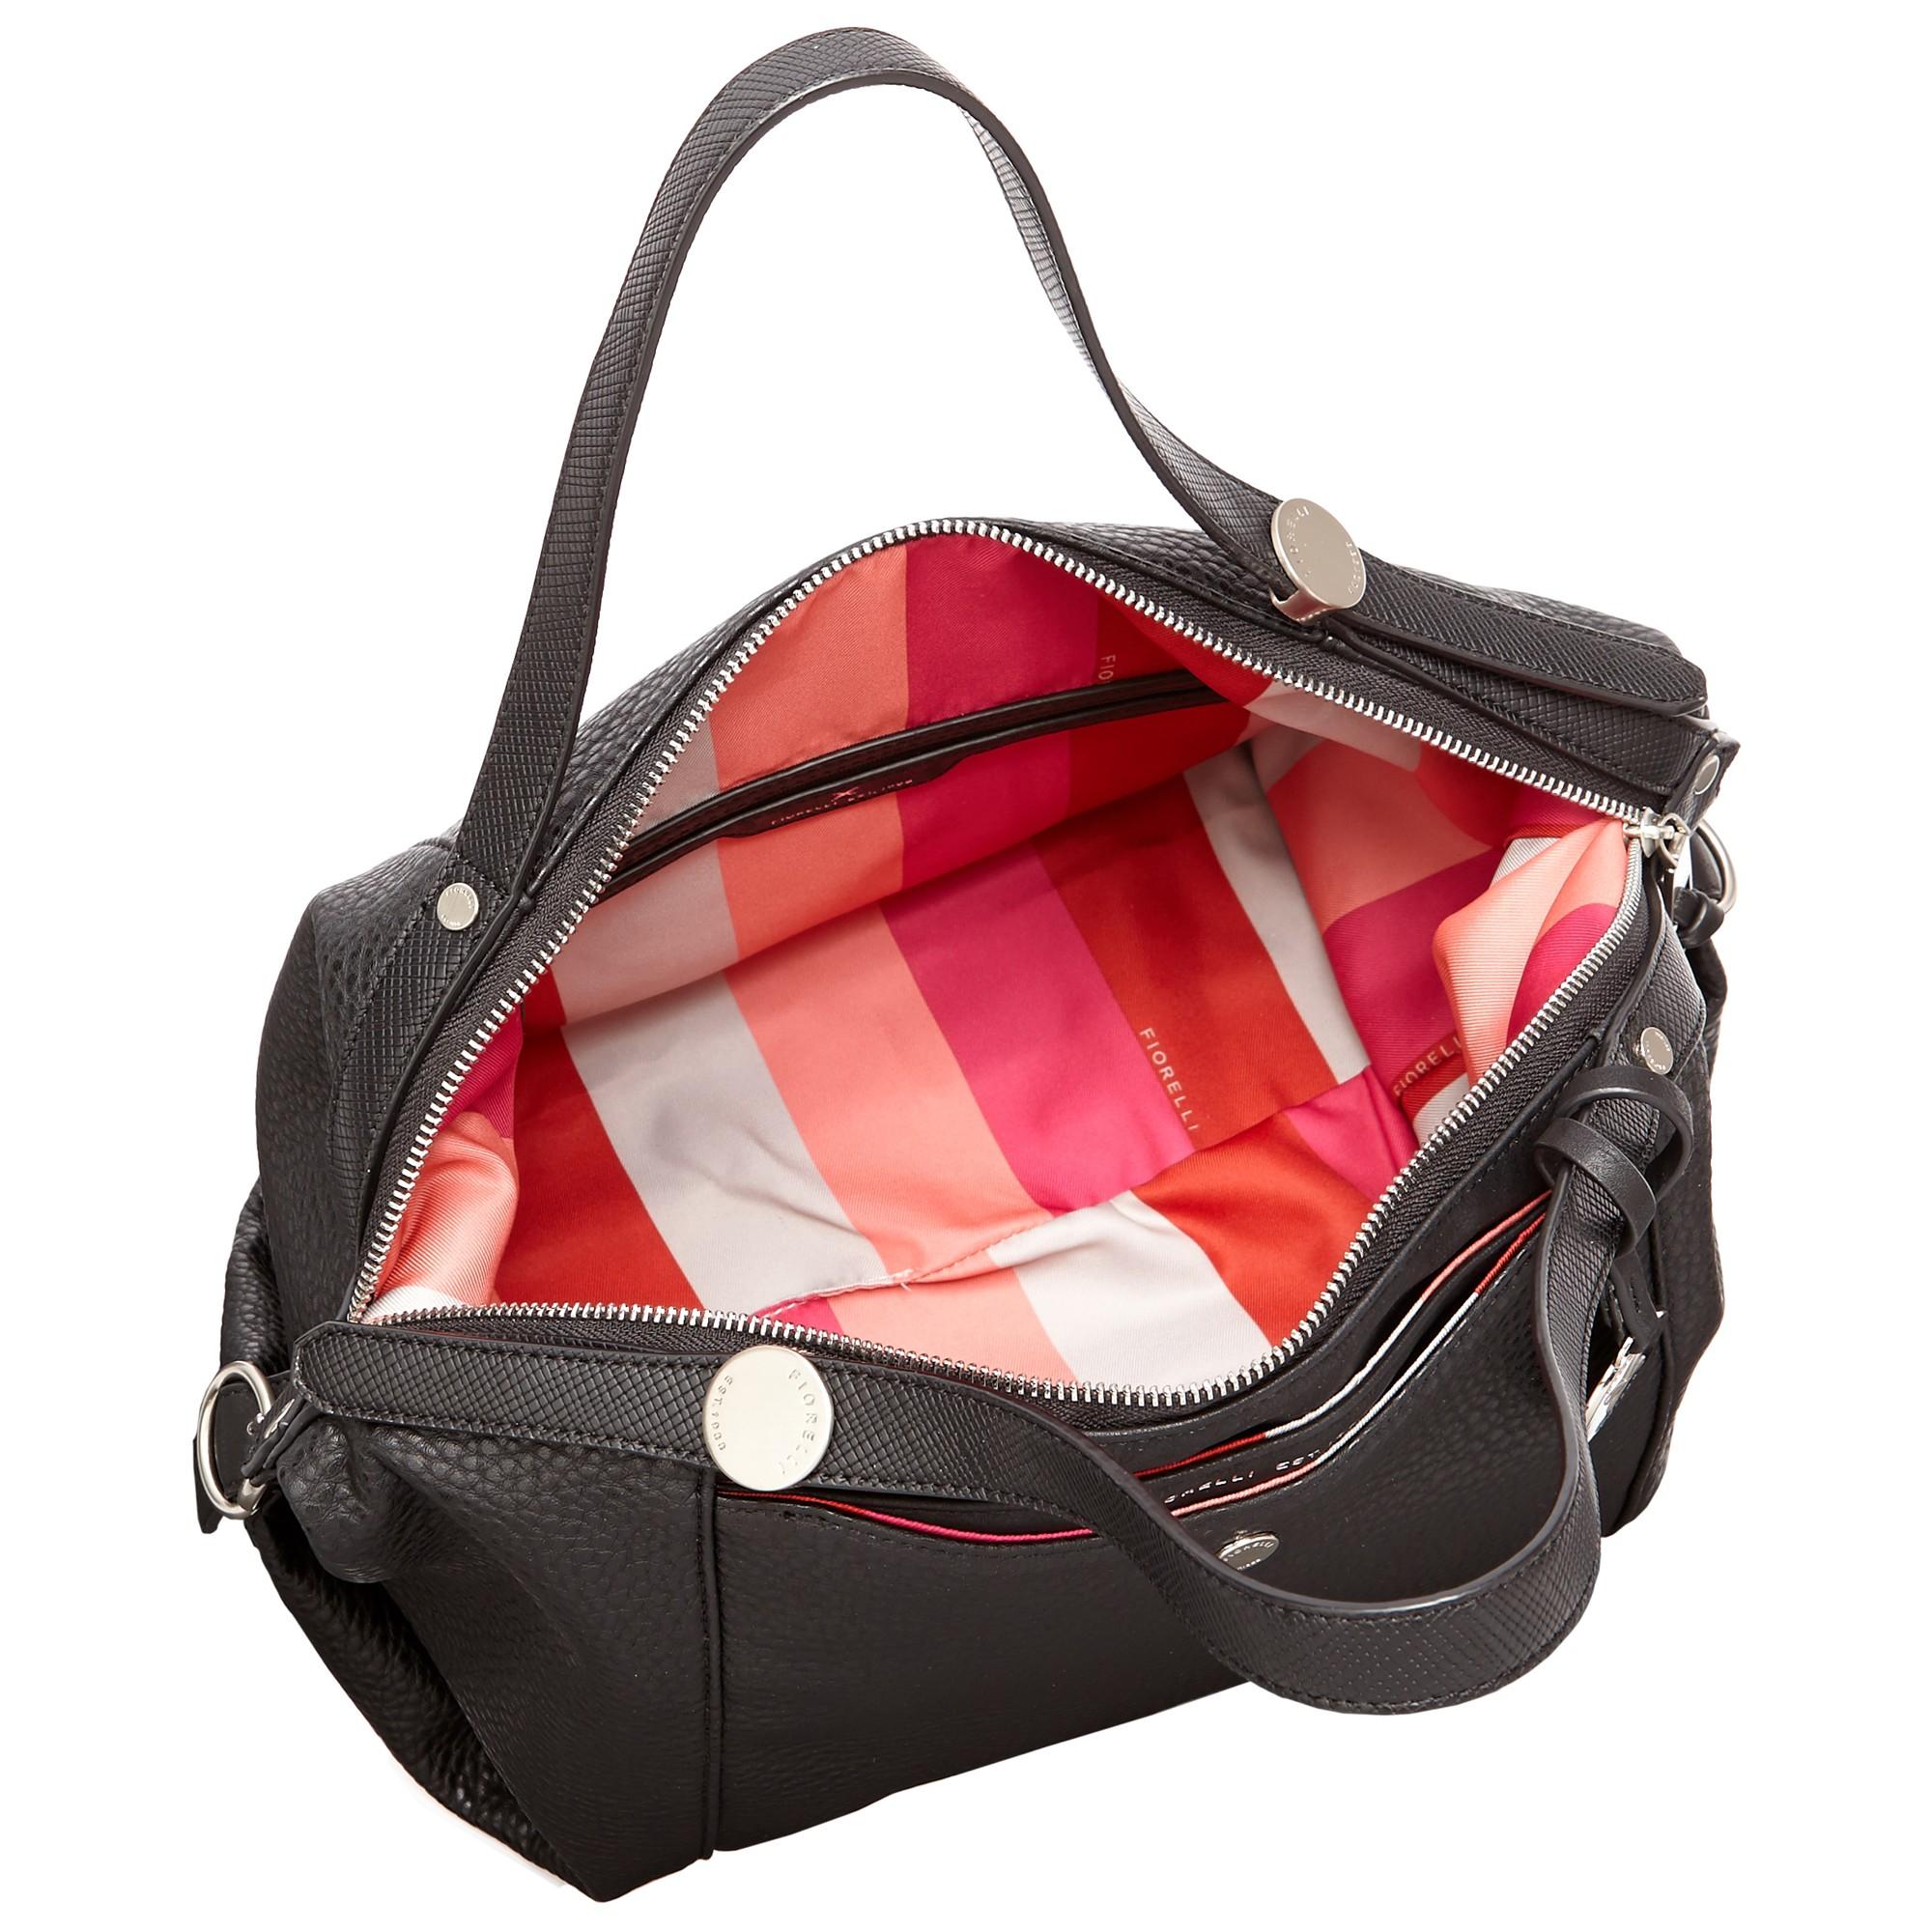 7d6b4575b7e Fiorelli Sinclair Shoulder Bag in Black - Lyst